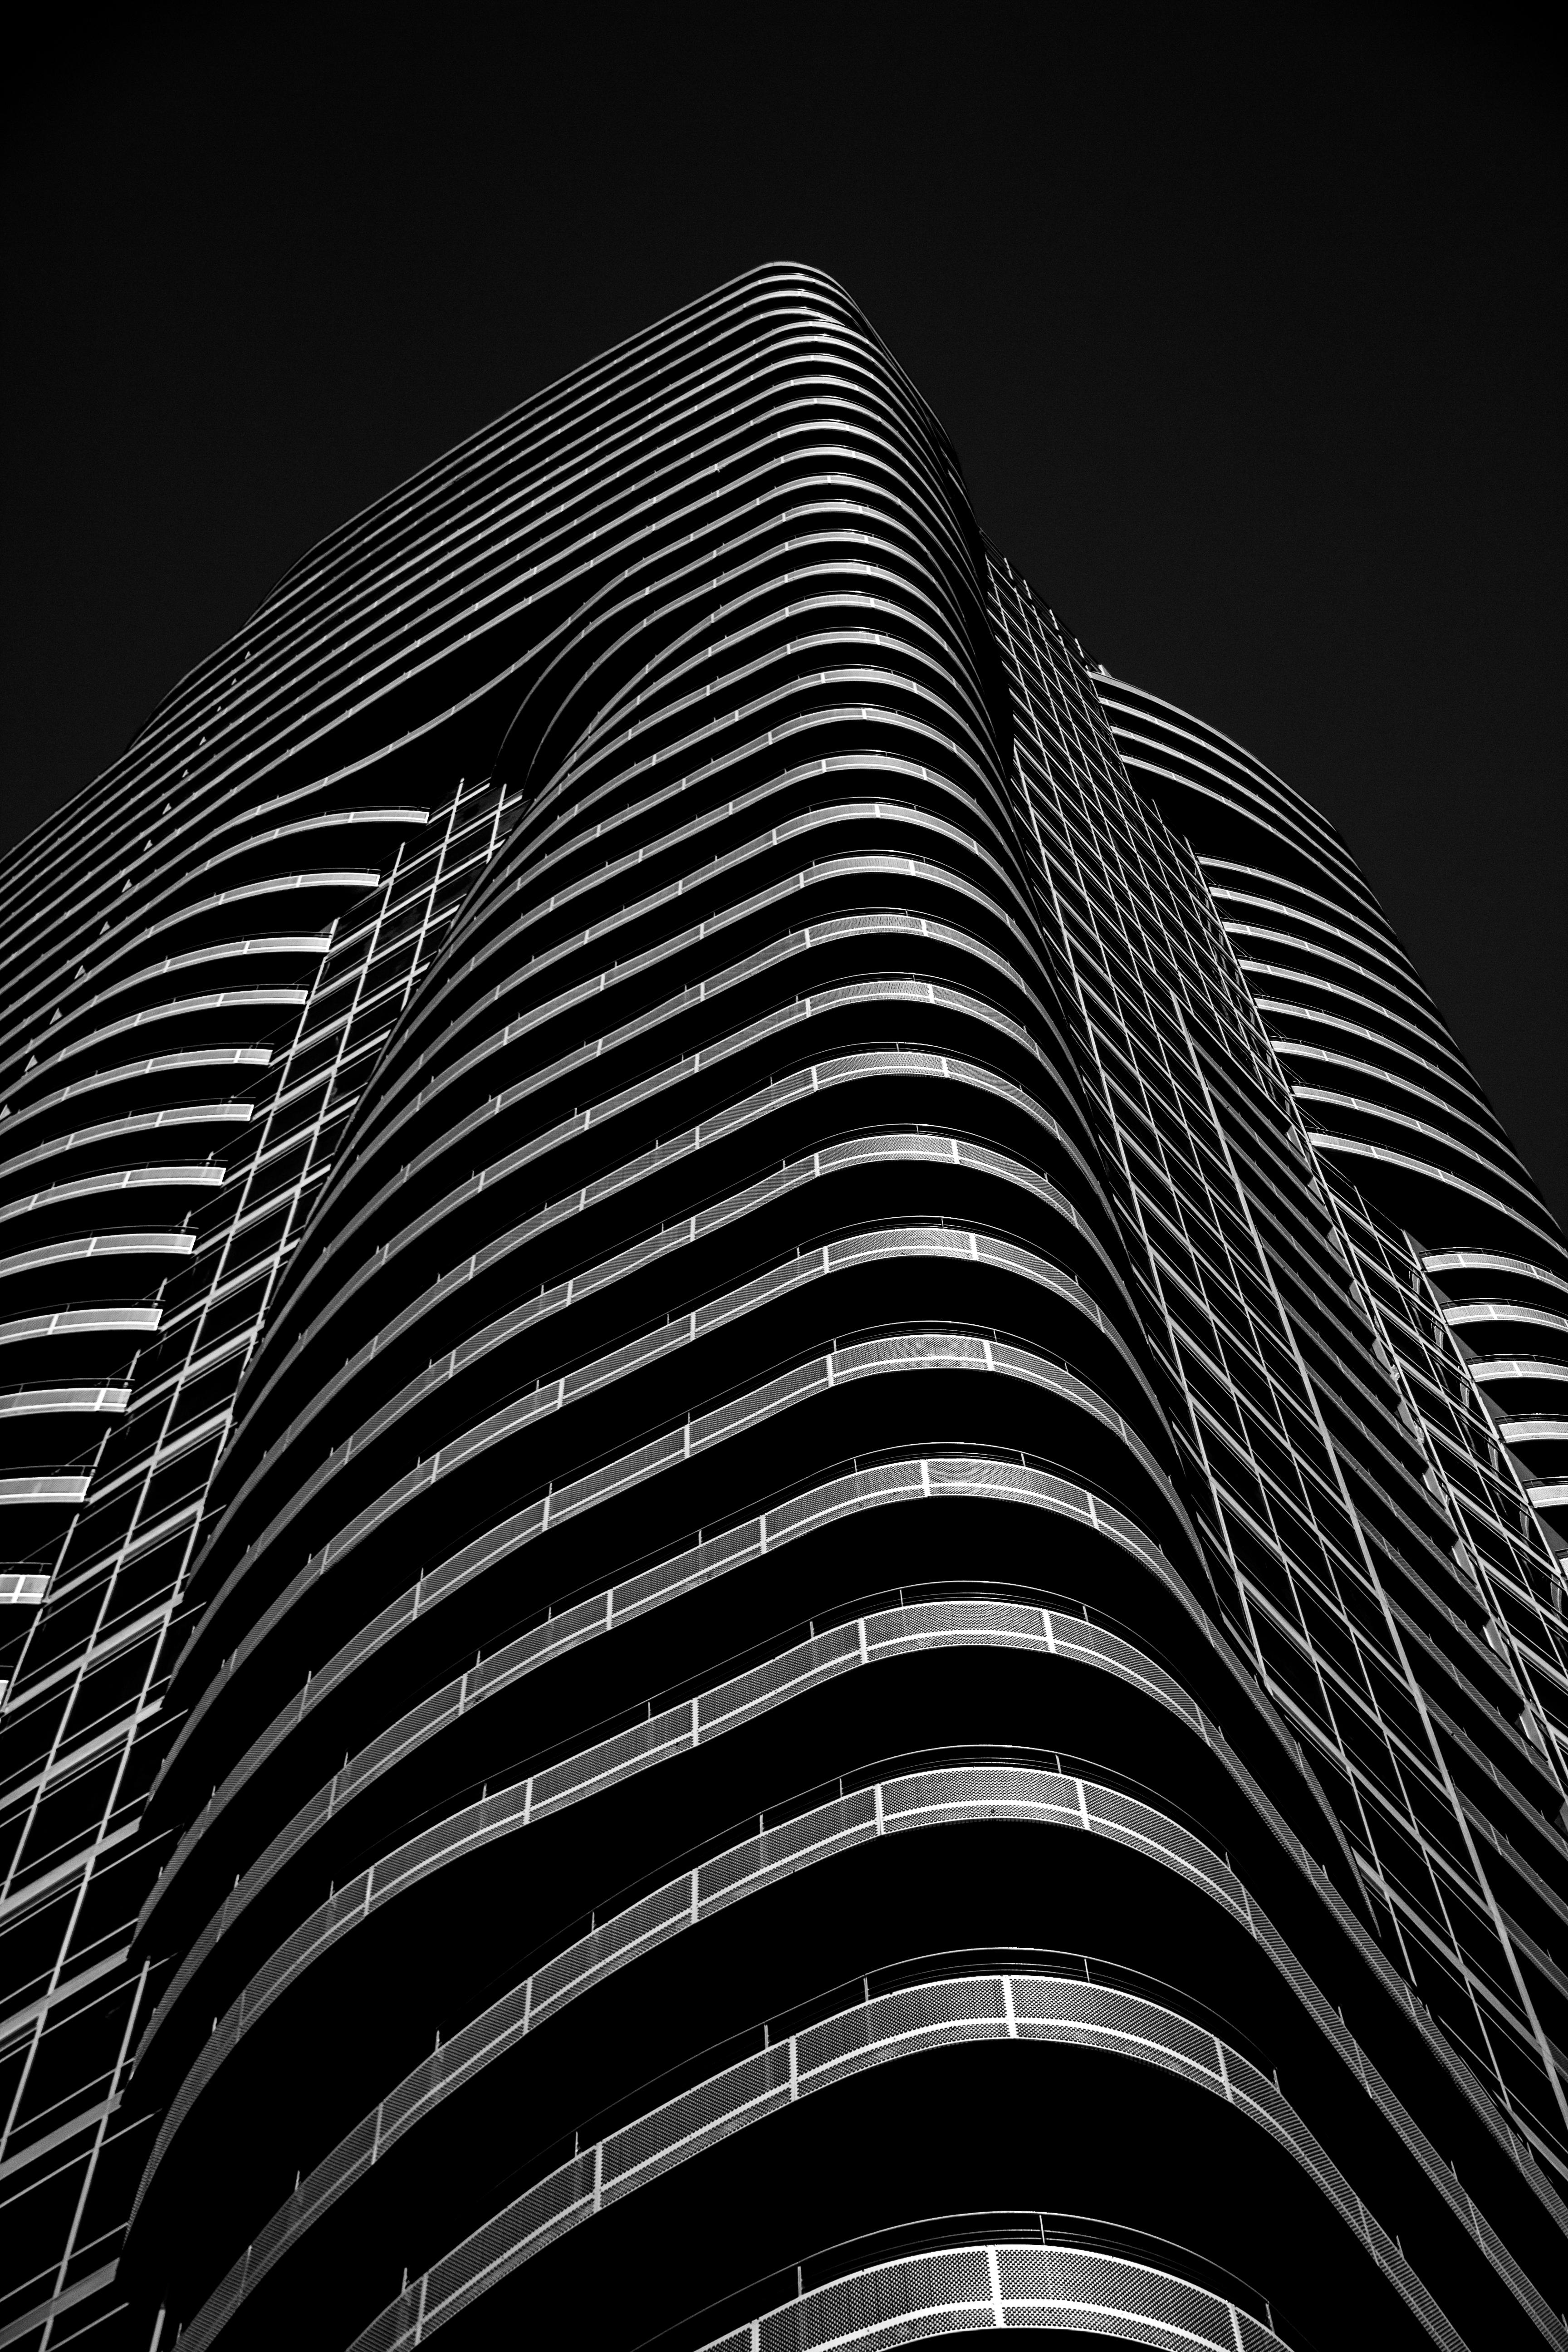 B&W Building 1